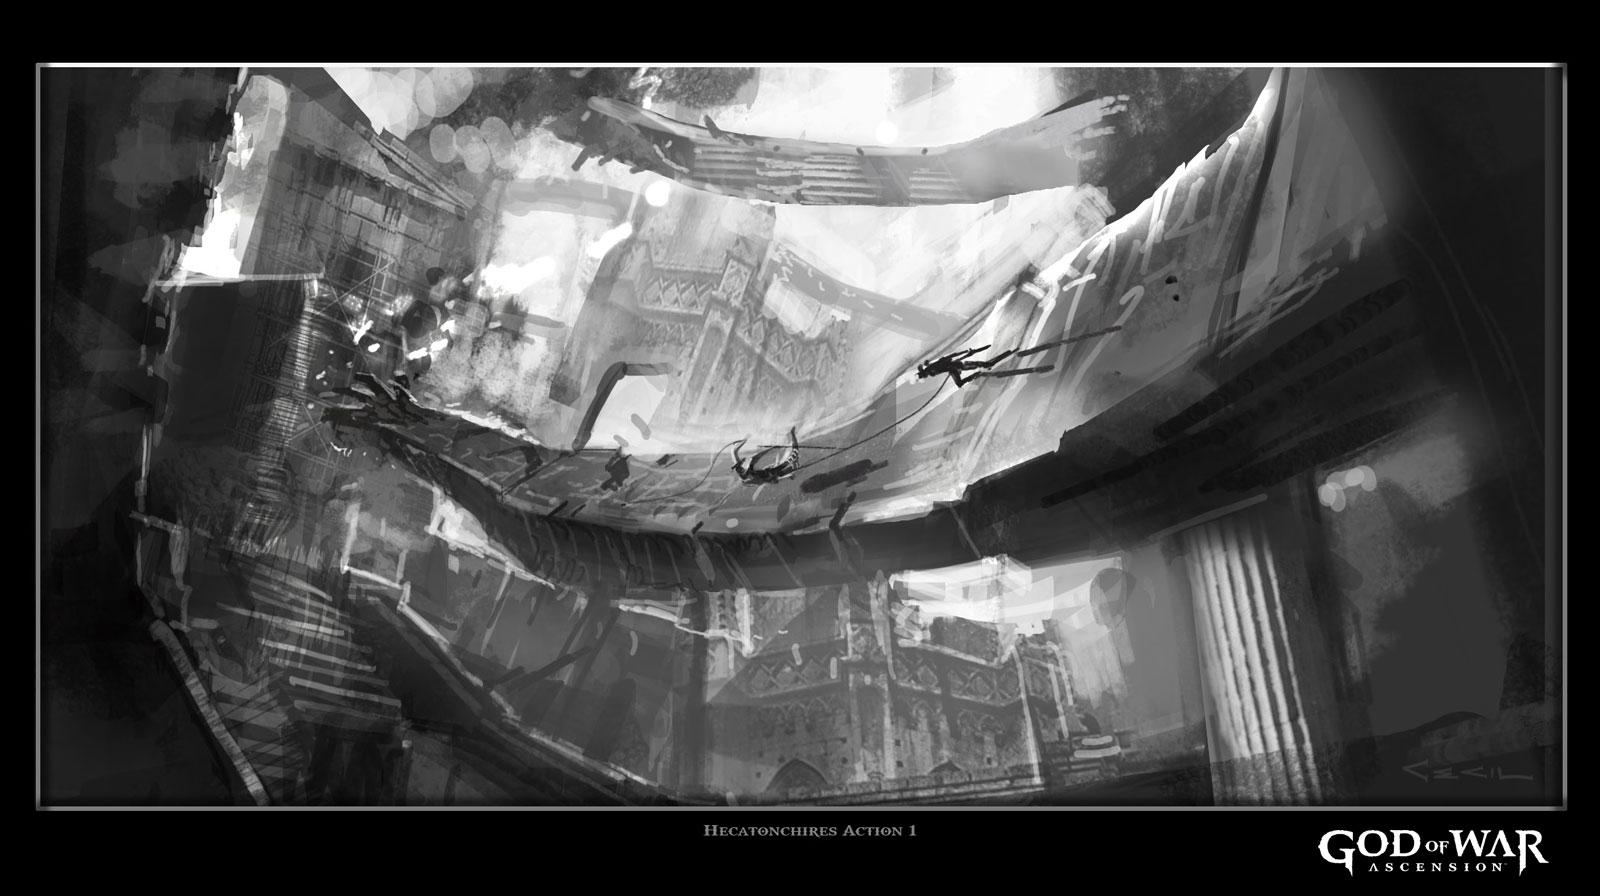 Imágenes de God of War: Ascension - MeriStation